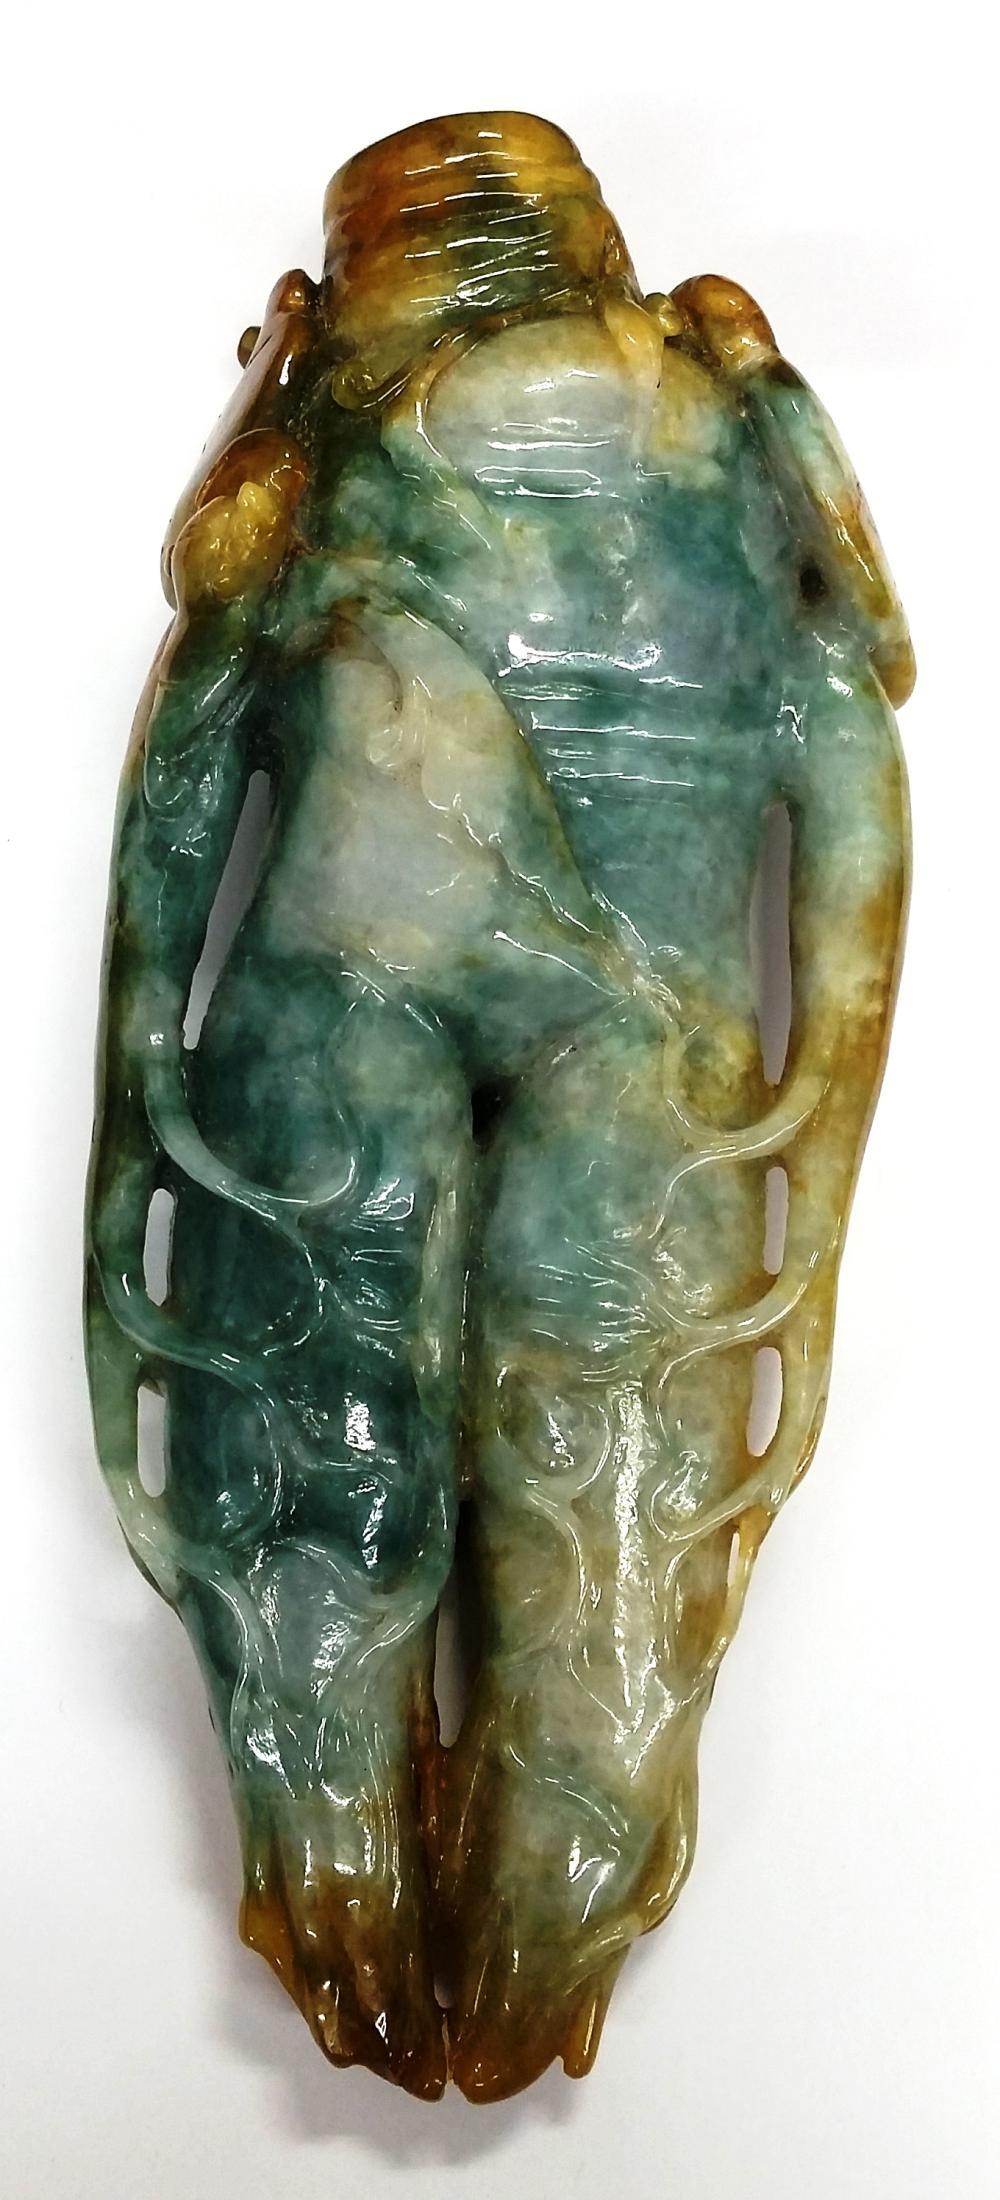 Antique Chinese Asian Rust Green Jadeite Jade Tentacle Algae Hand Man